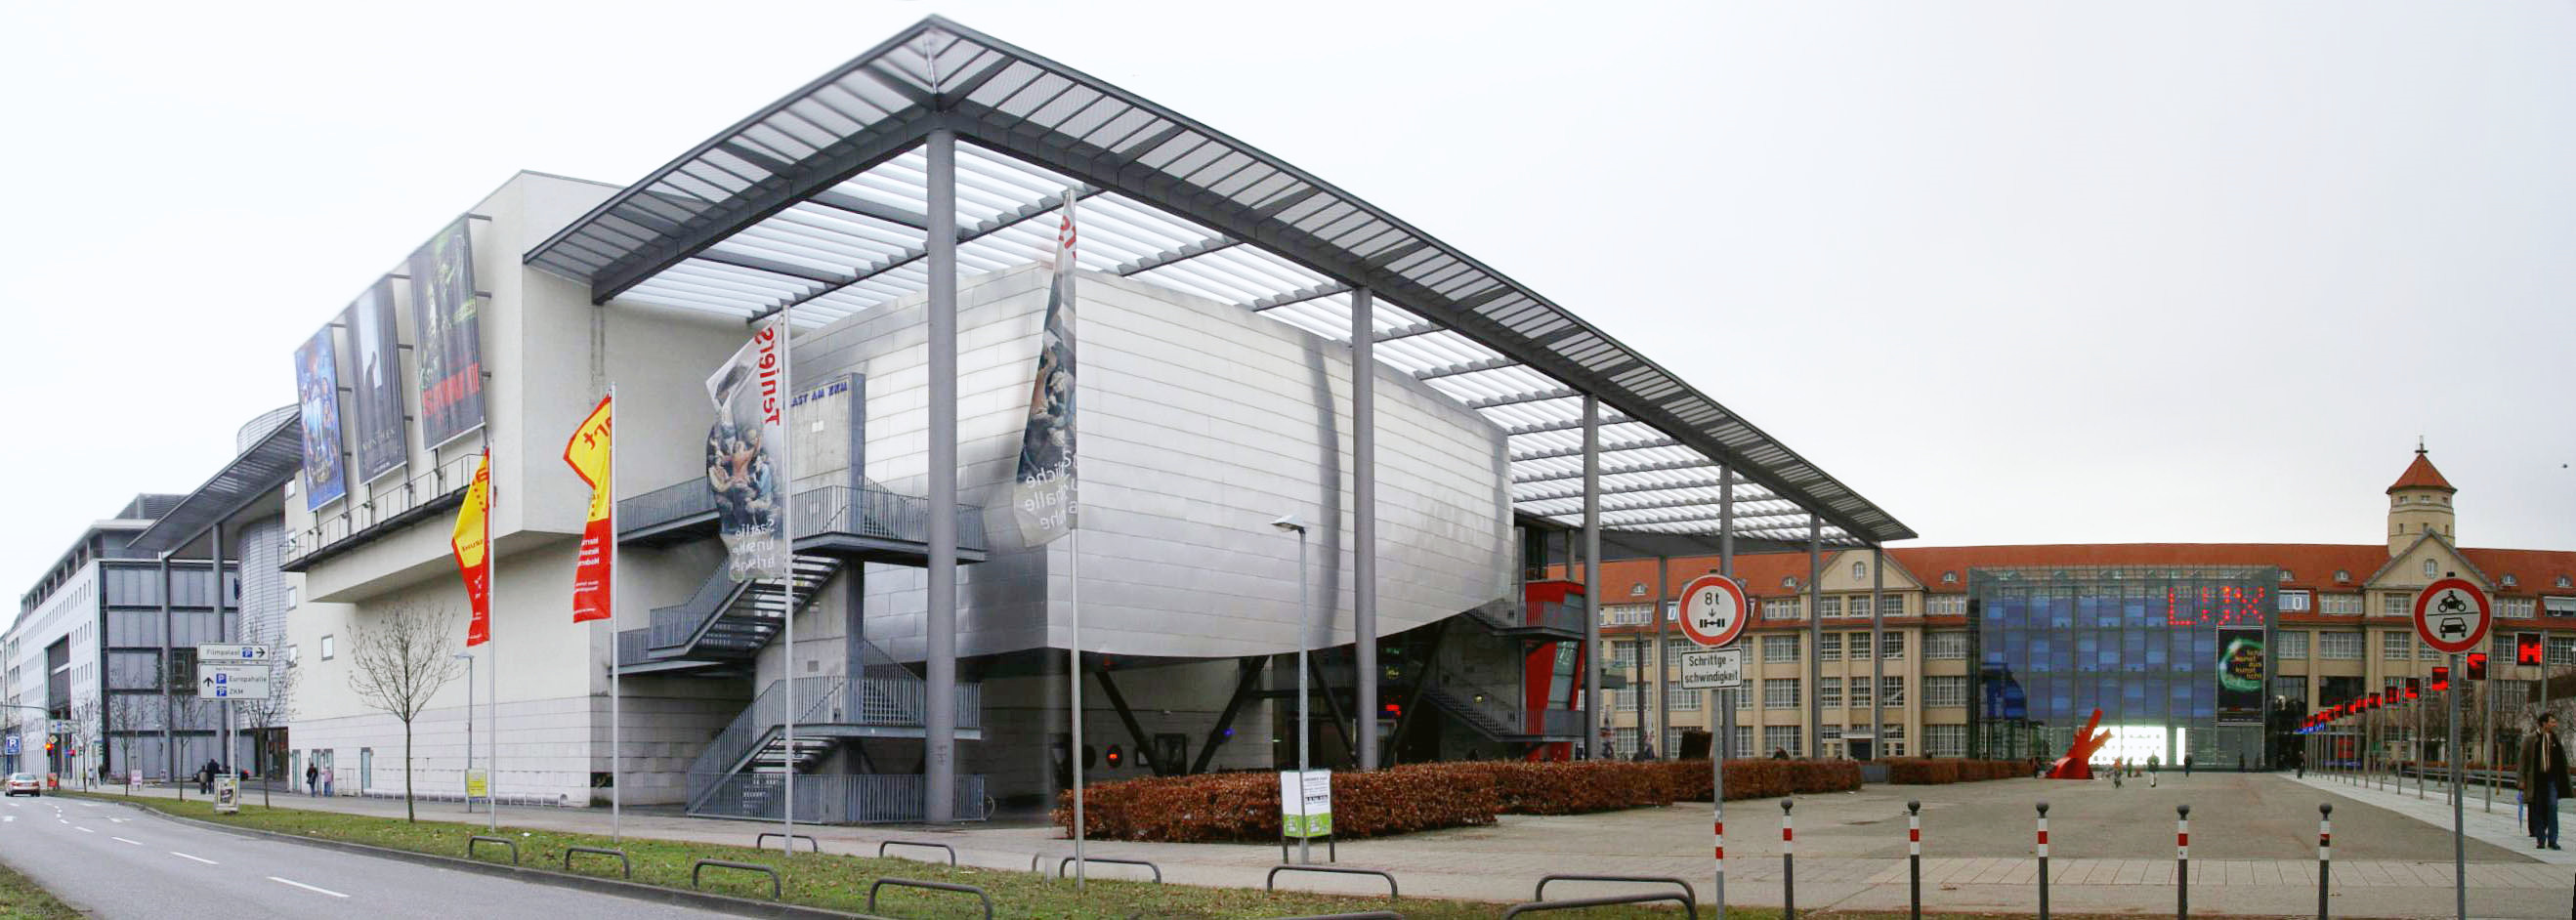 Zkm Karlsruhe Kino